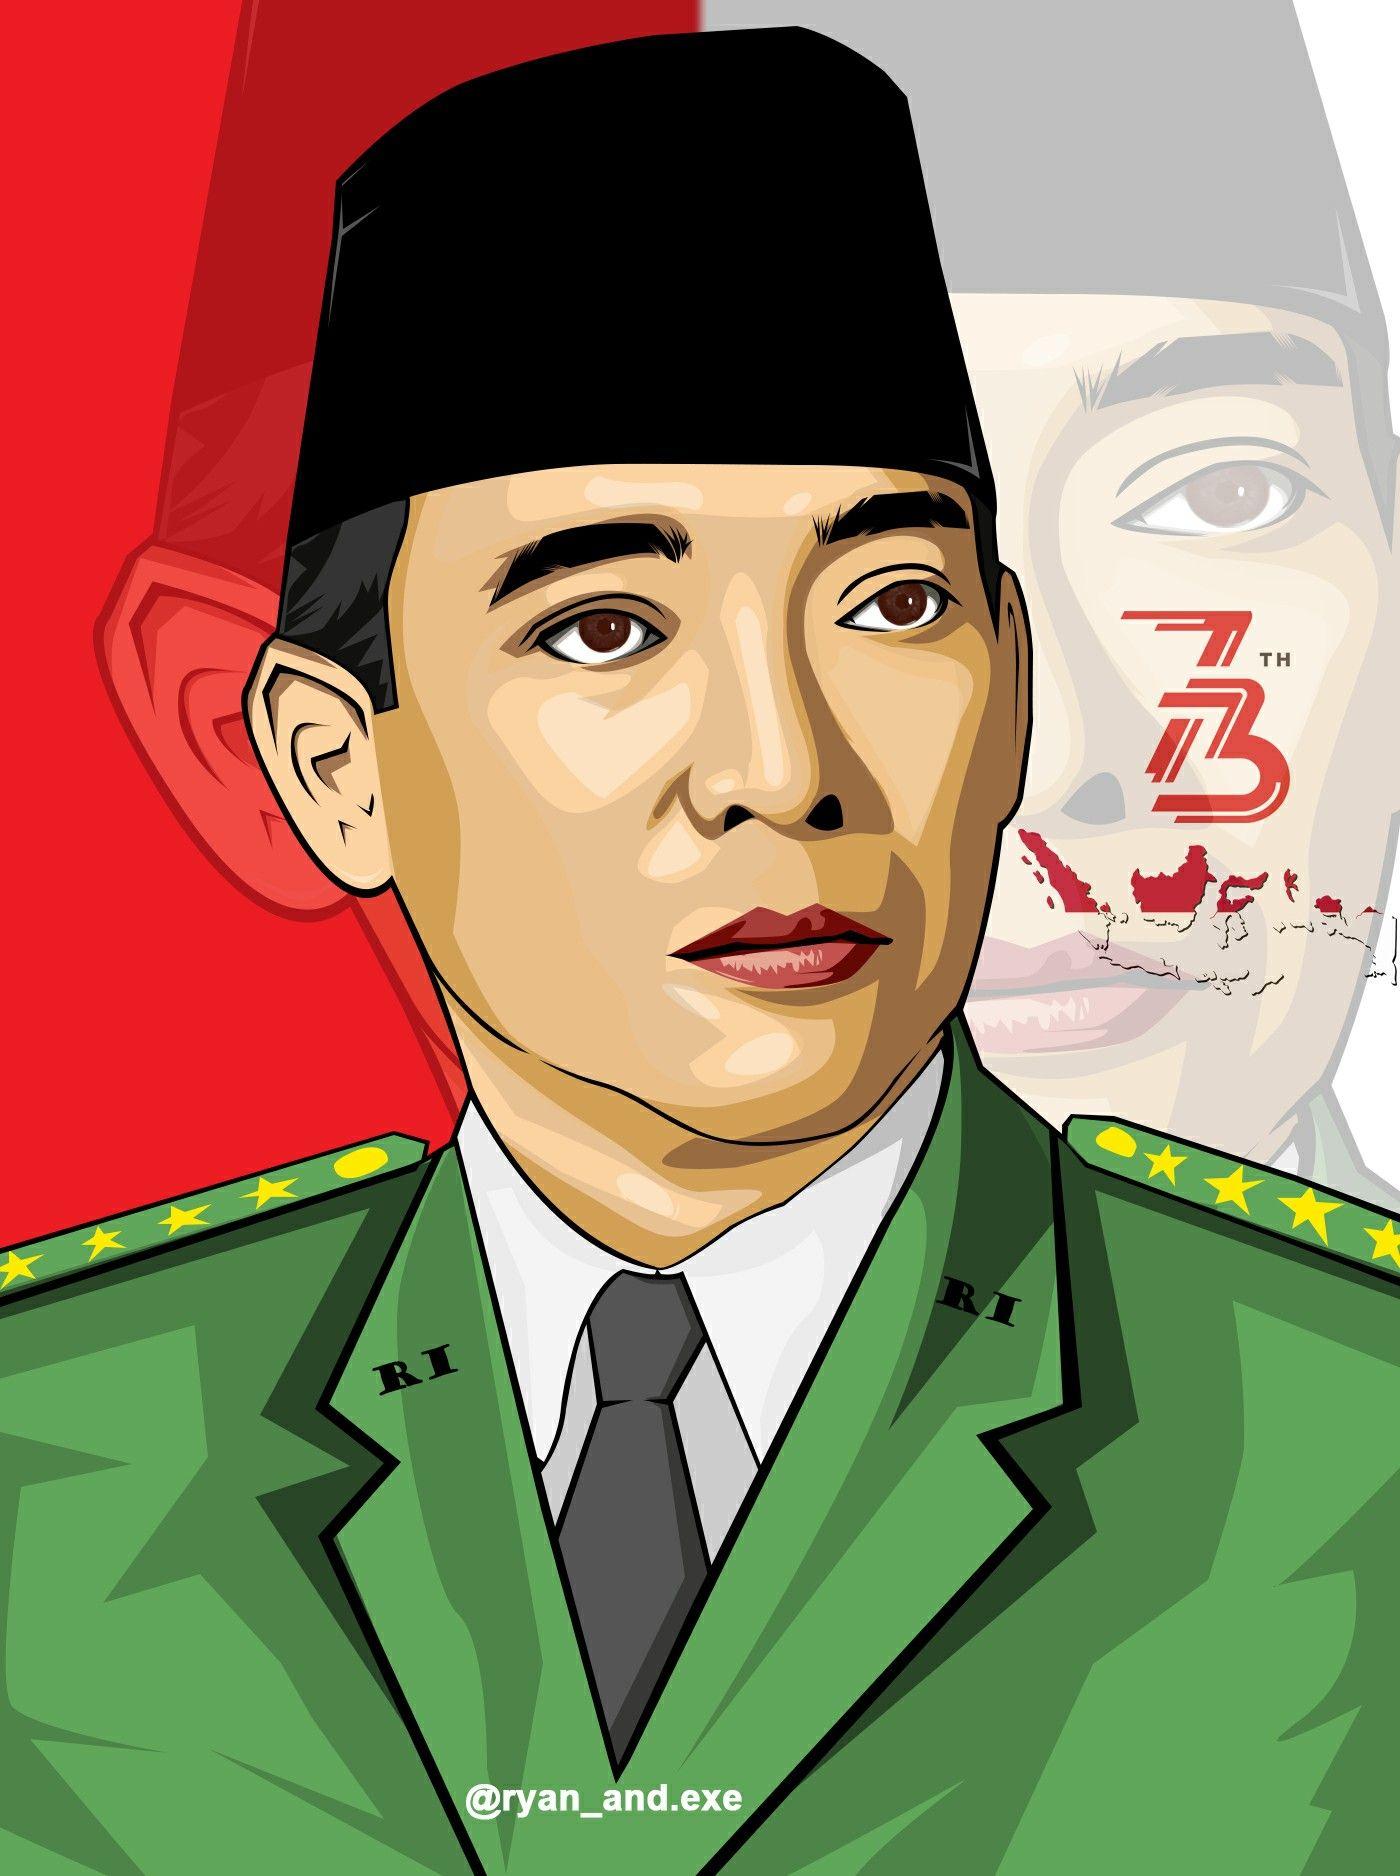 Gambar Ir Soekarno Hatta